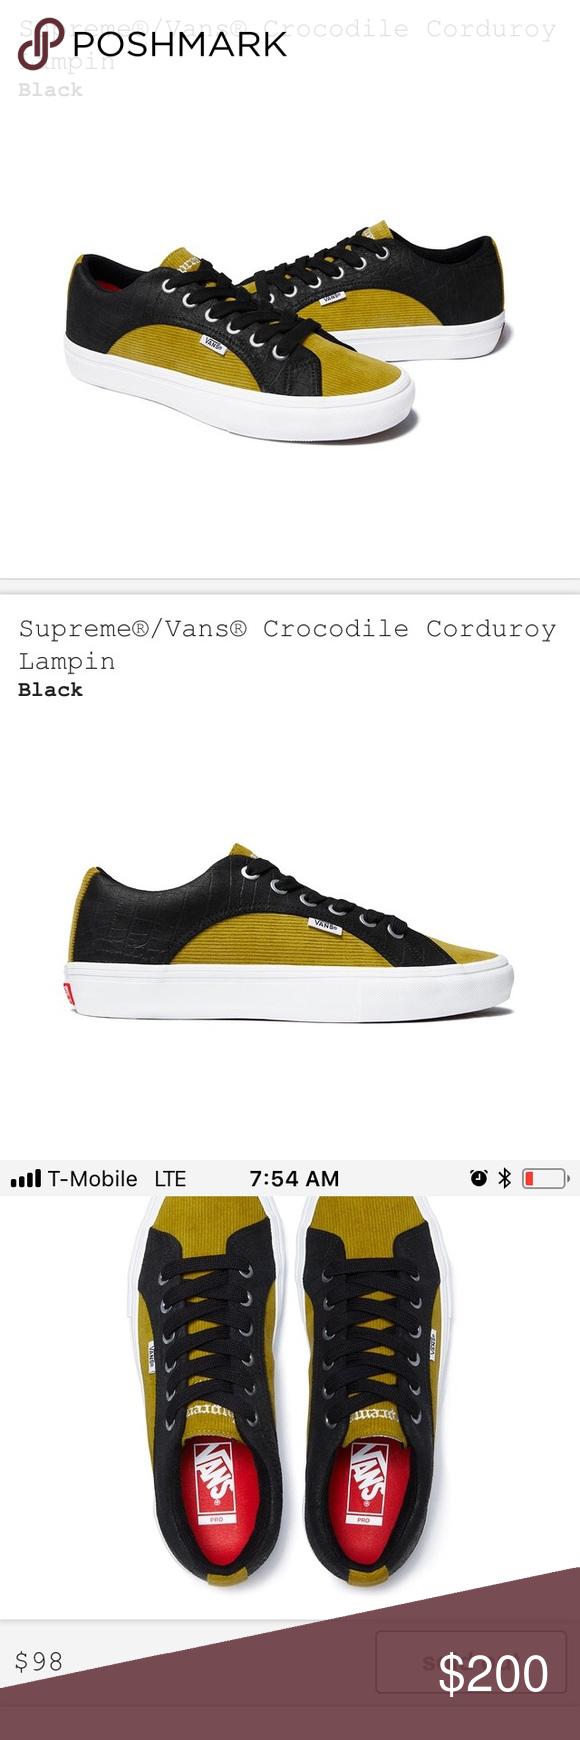 e9eaa1296c Supreme X Vans Crocodile Corduroy Lampin Sneakers New With Box Deadstock.  Supreme   Vans Collaboration. Supreme X Vans Crocodile Corduroy Black    Green ...